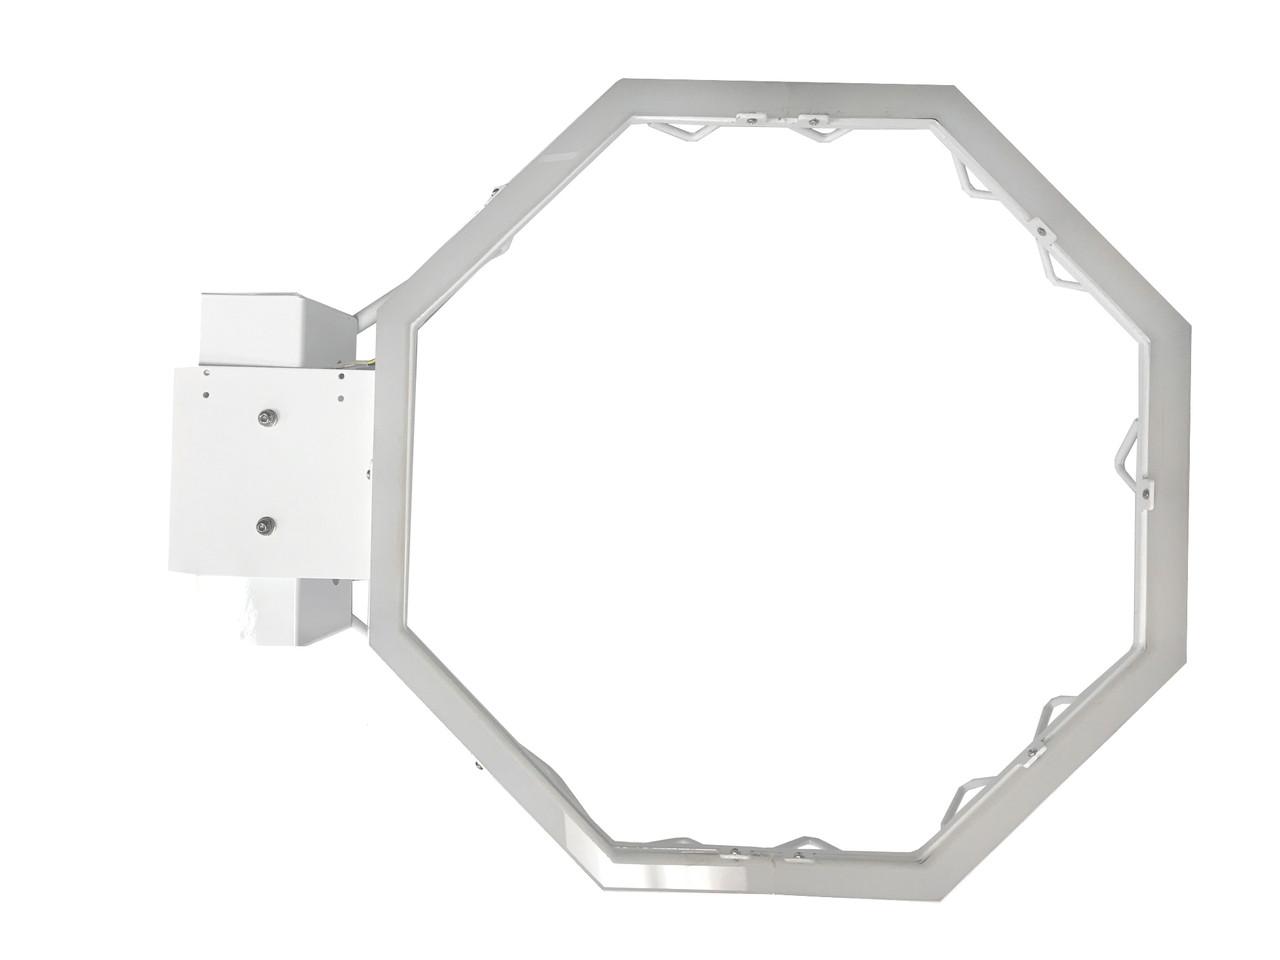 Octagonal Basketball Hoop, Metal Only, for HYPERshoot (HSH-SA-024-R0)